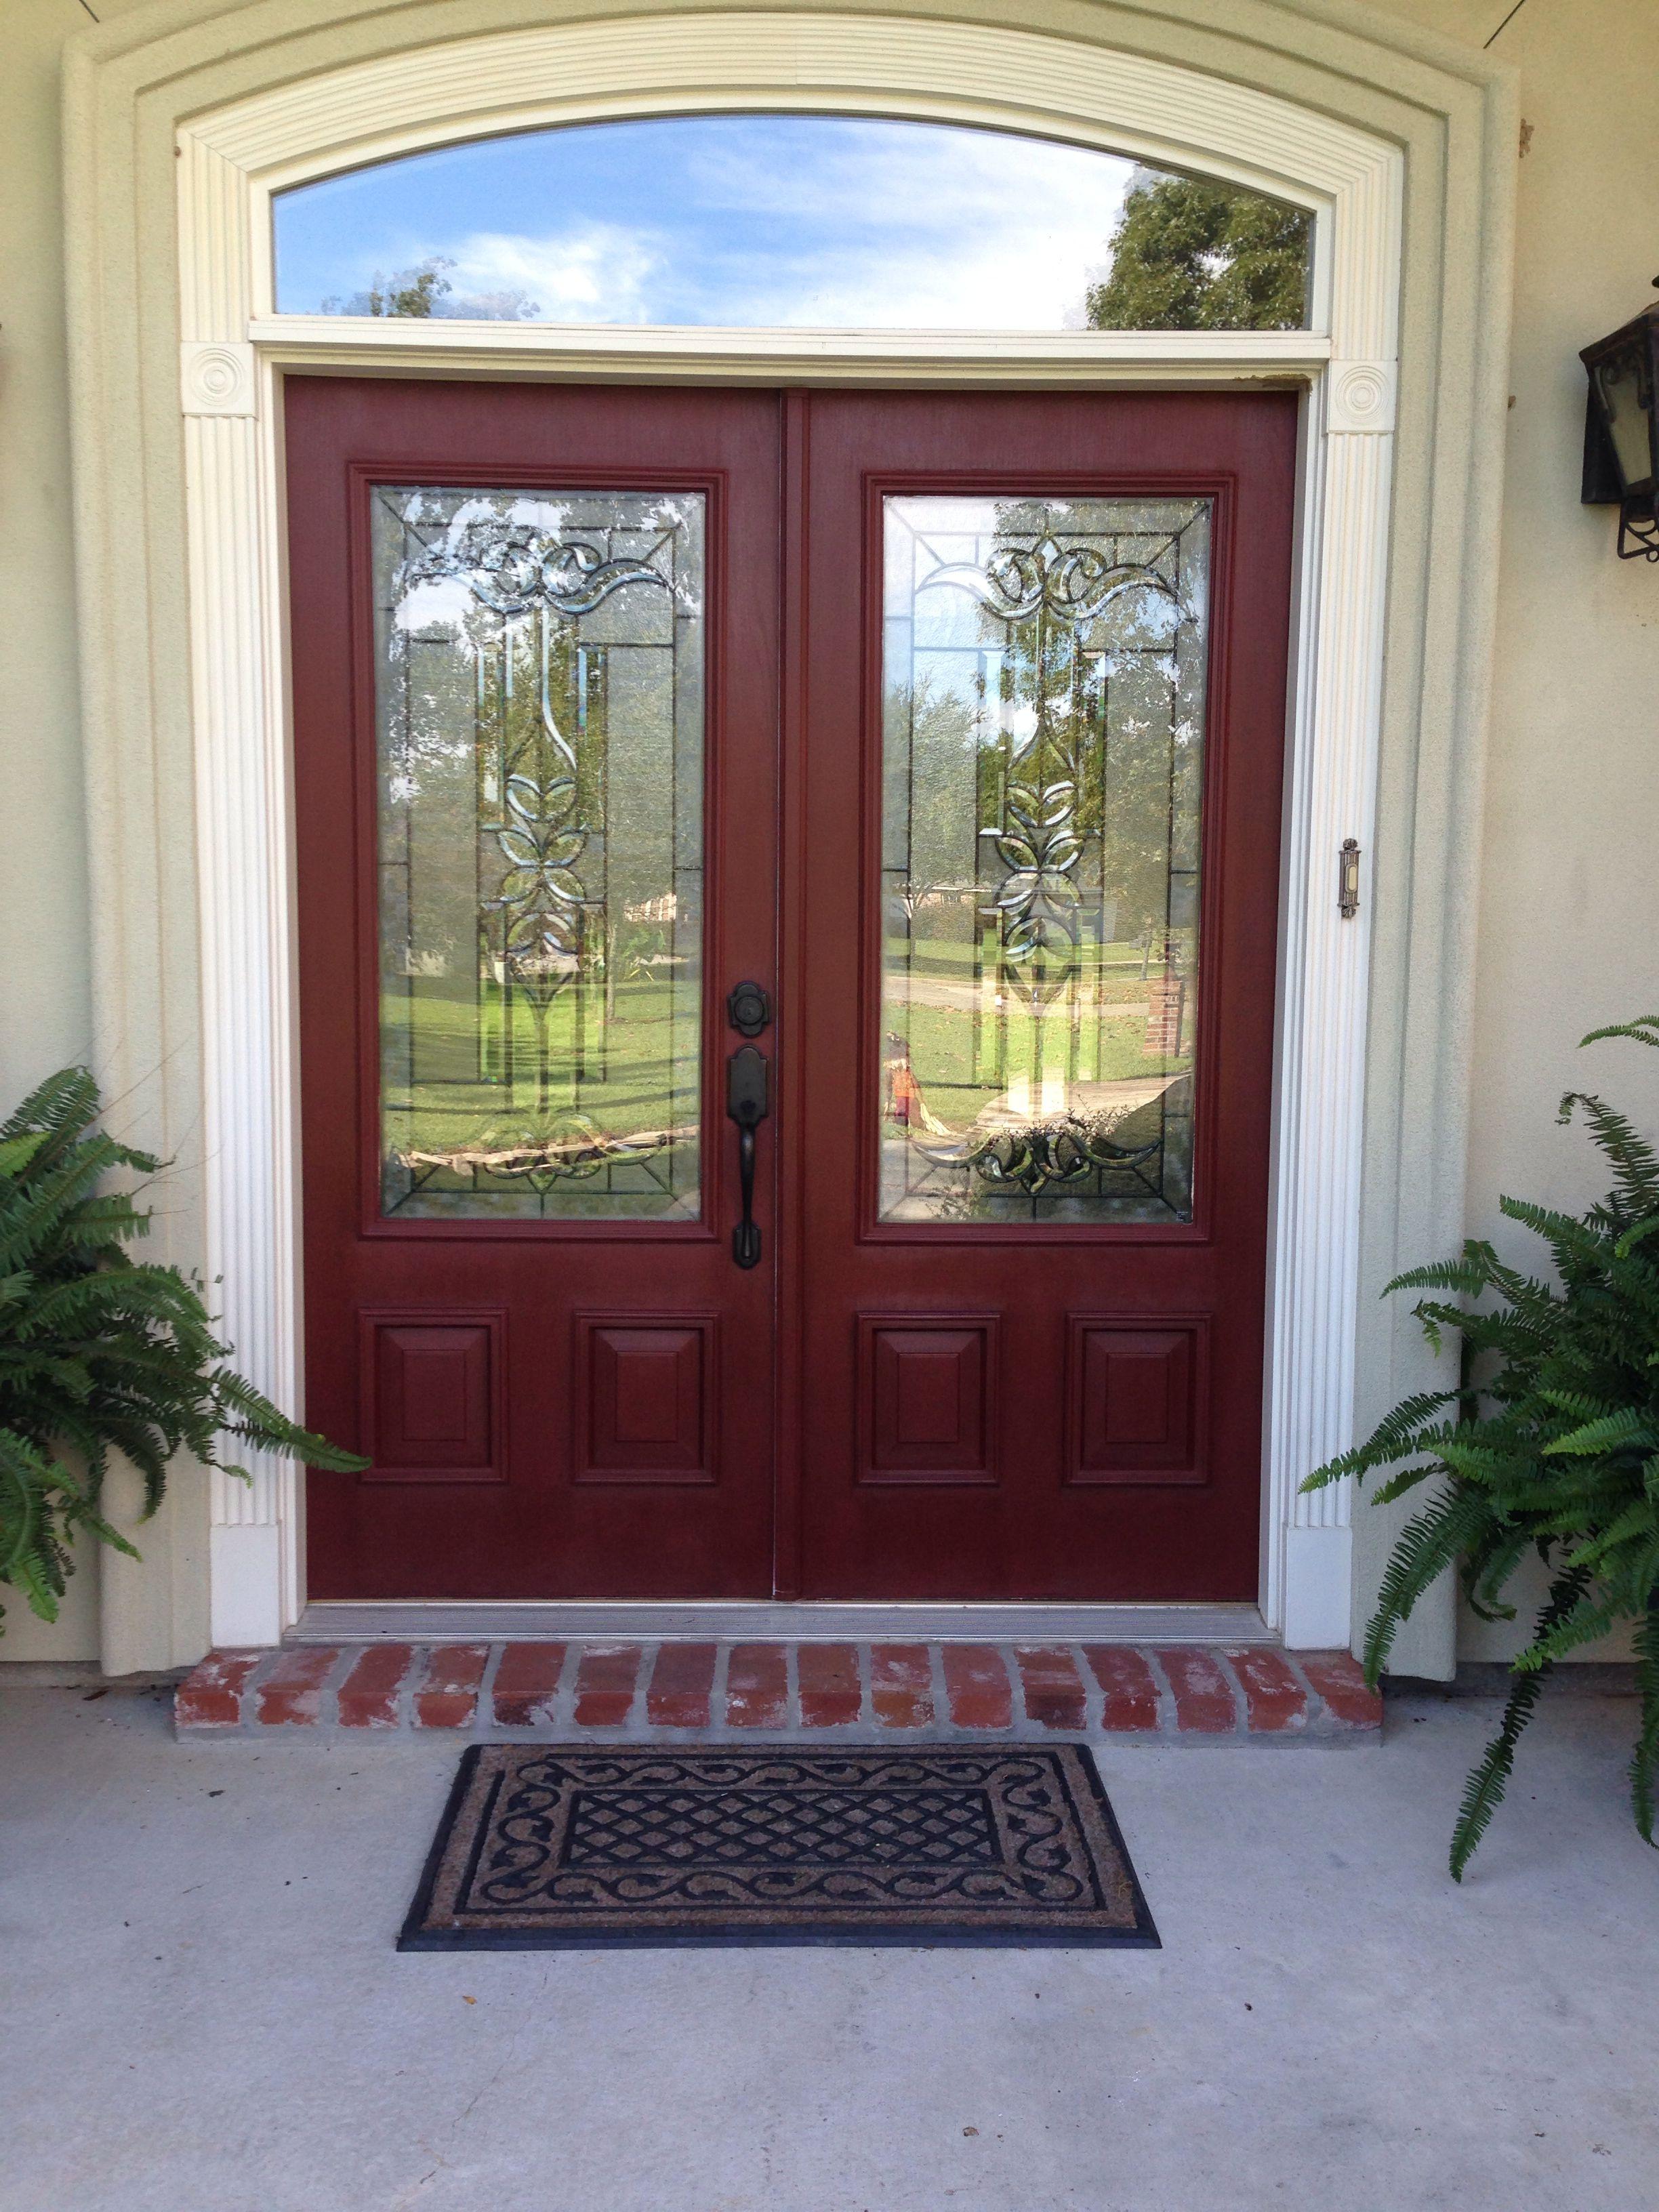 Refinished Fiberglass Door With 2 Coats Annie Sloan Chalk Paint In